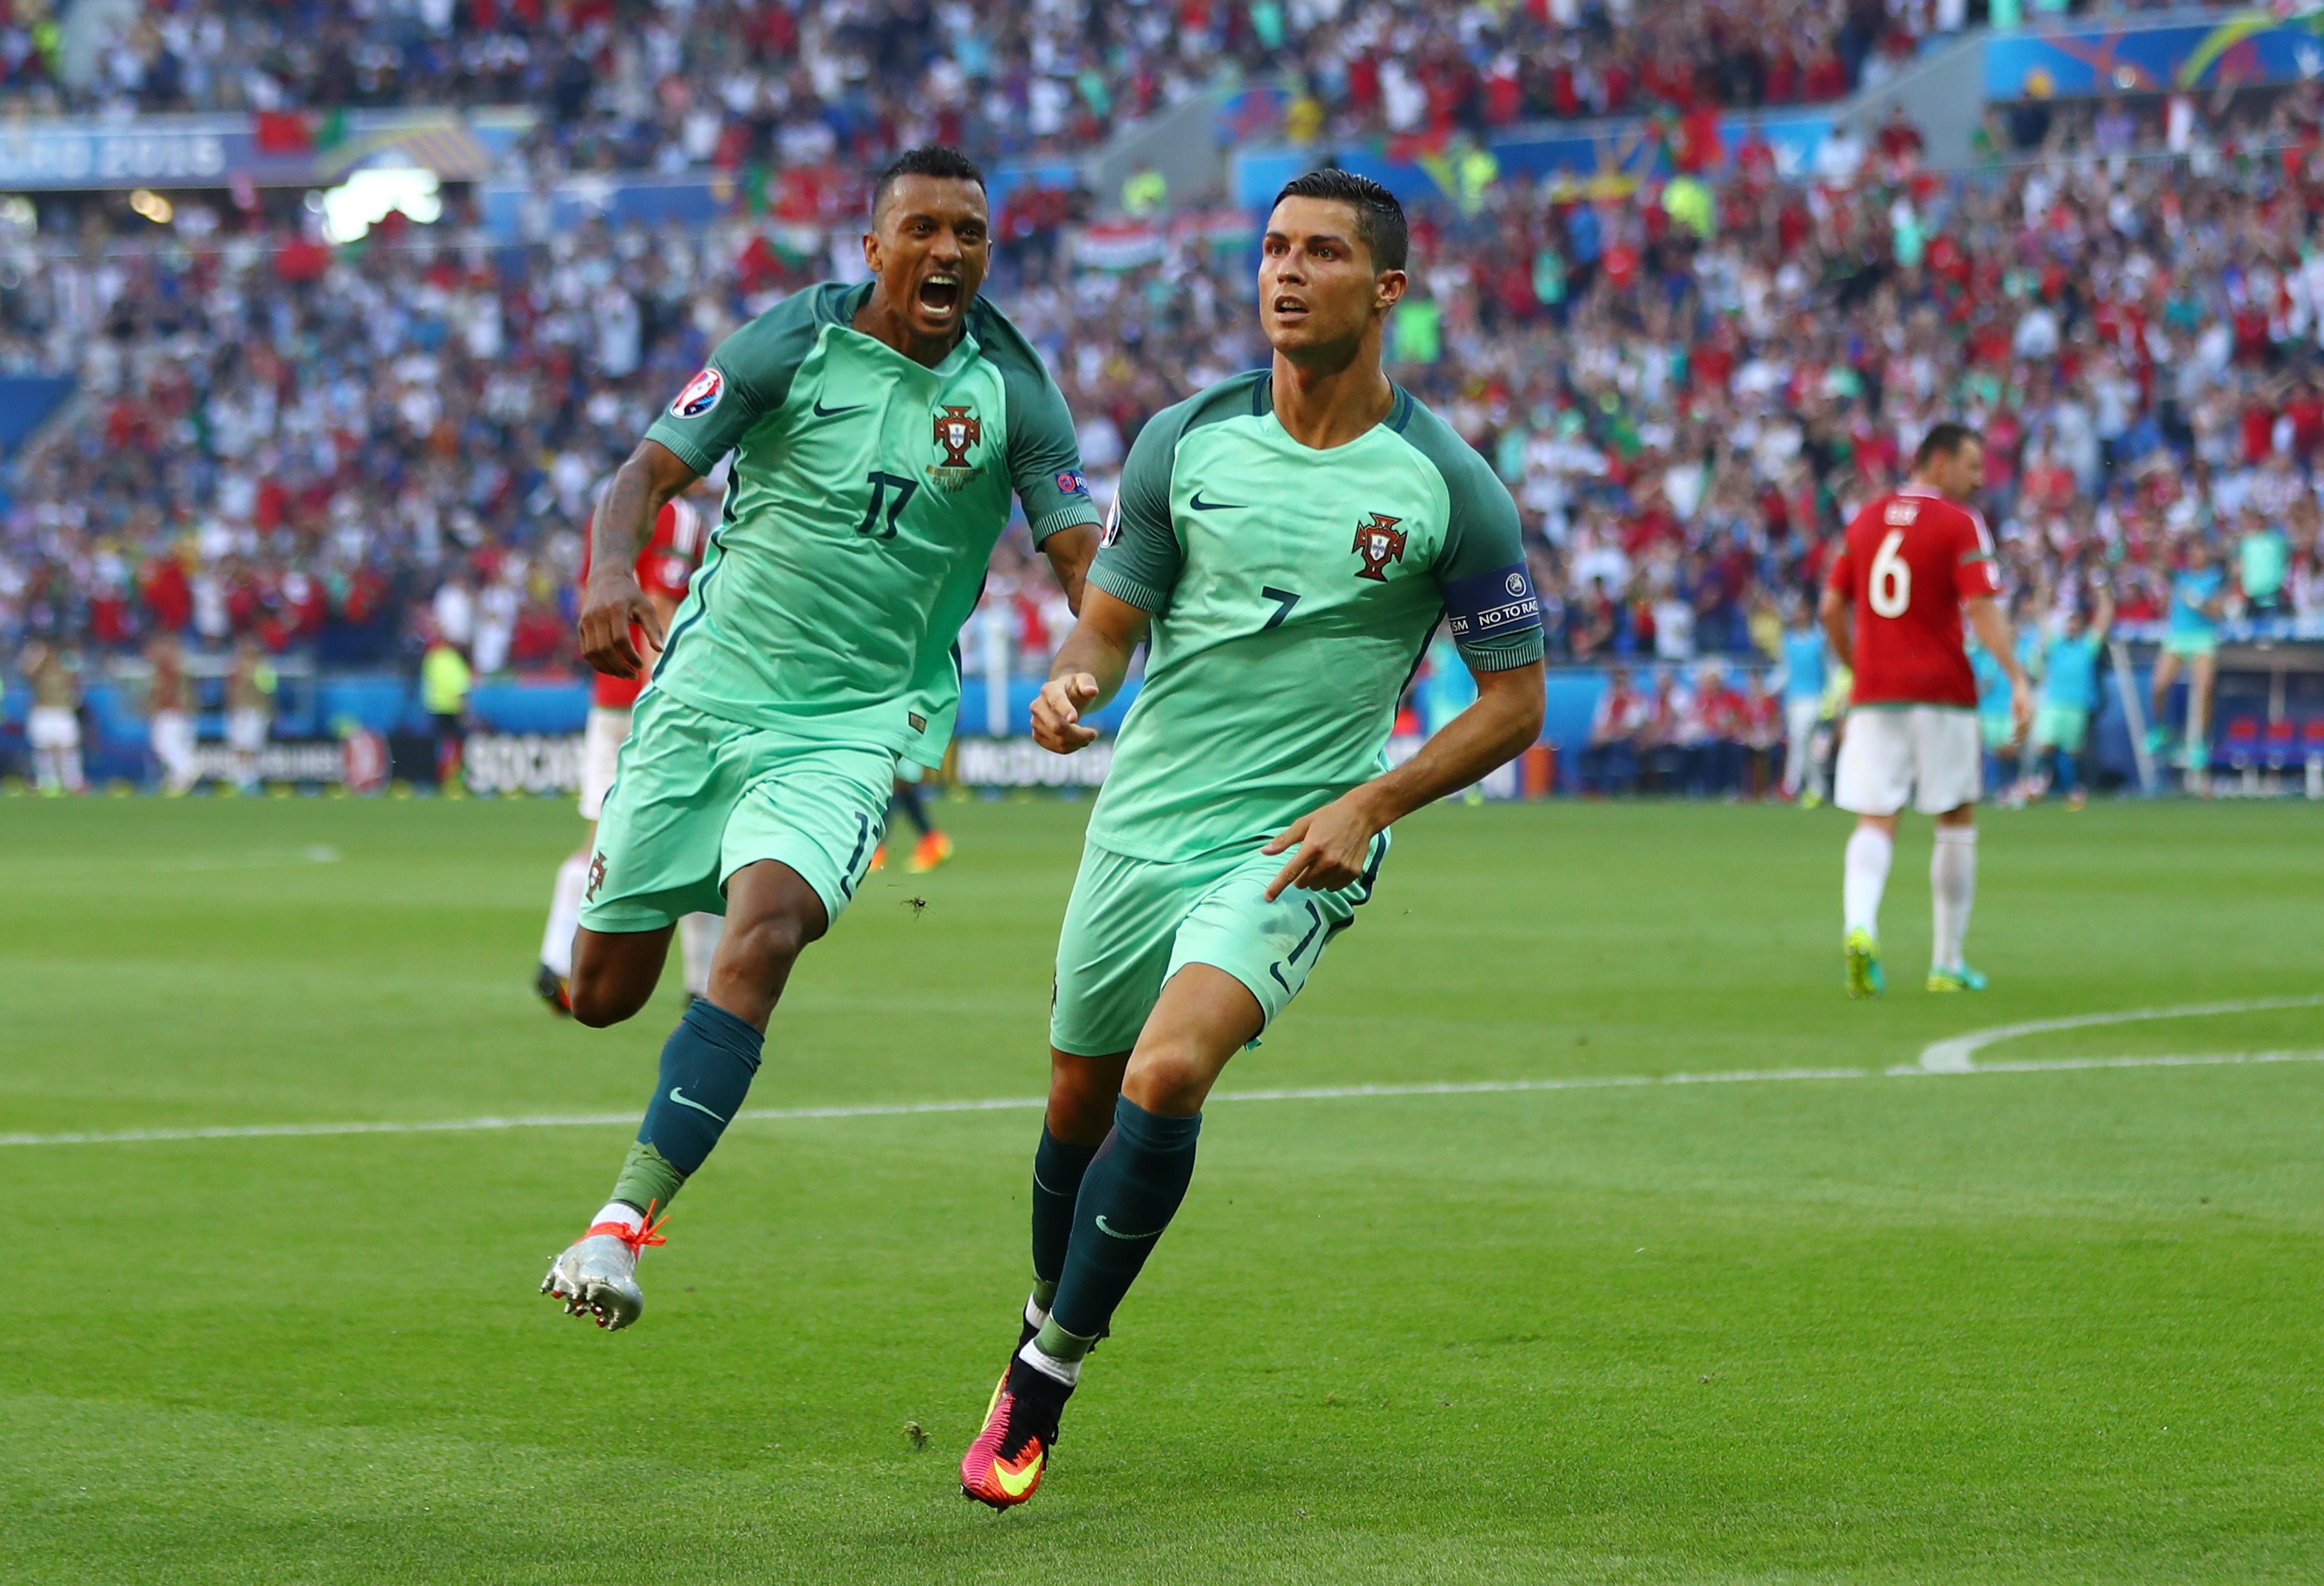 Hungary v Portugal - Group F: UEFA Euro 2016